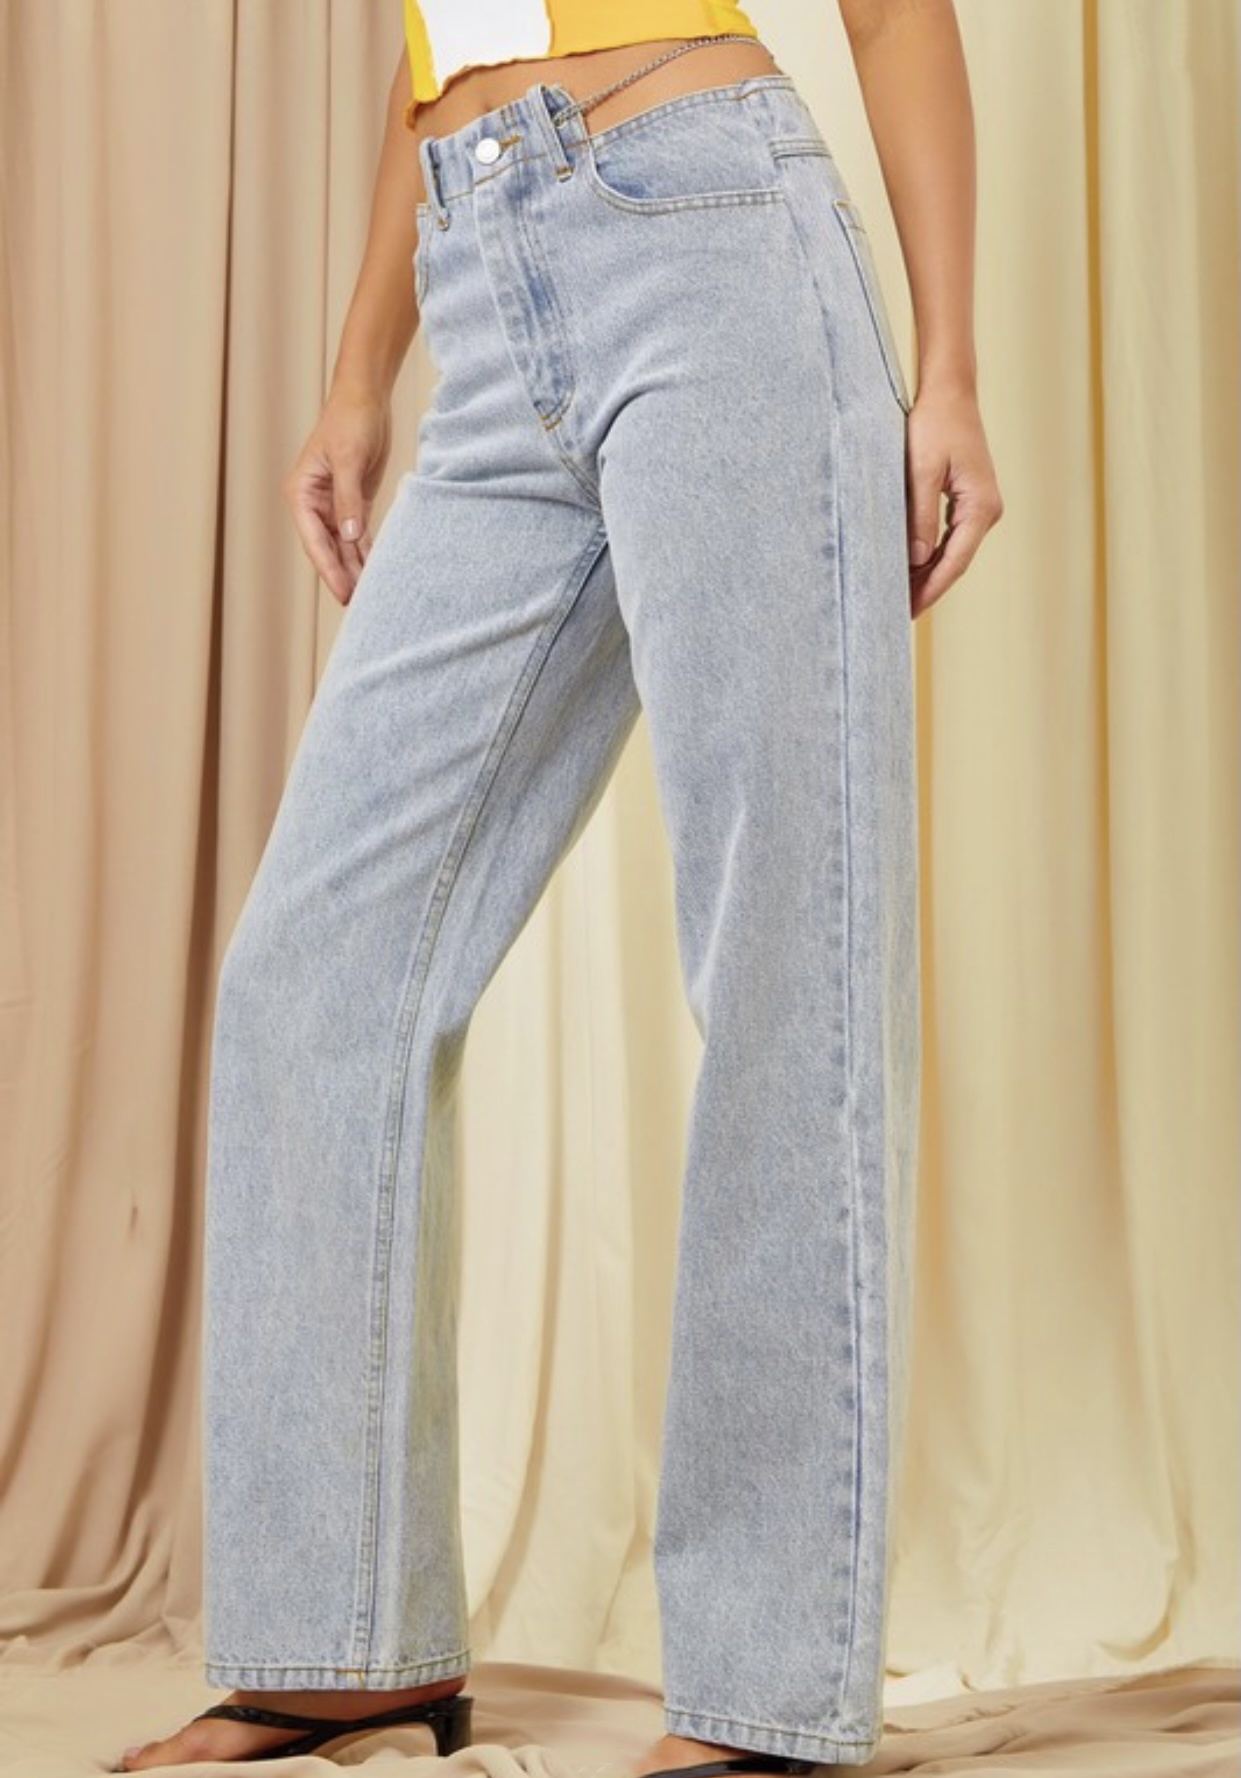 Nolita Chain Jeans